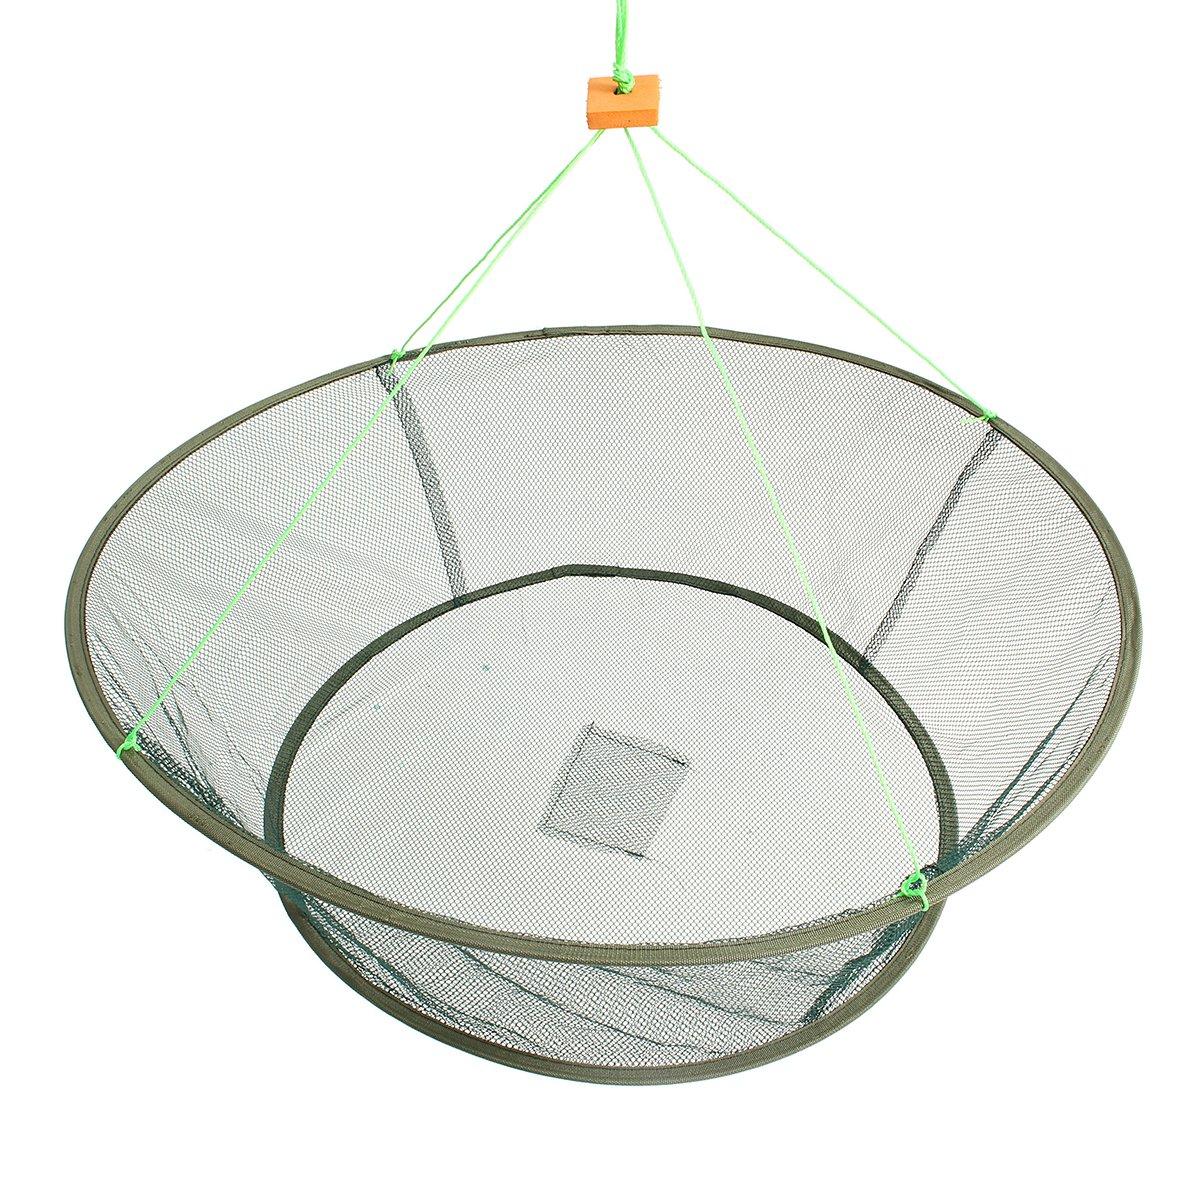 QOJA zanlure foldable fishing net prawn bait minnow crab shrimp